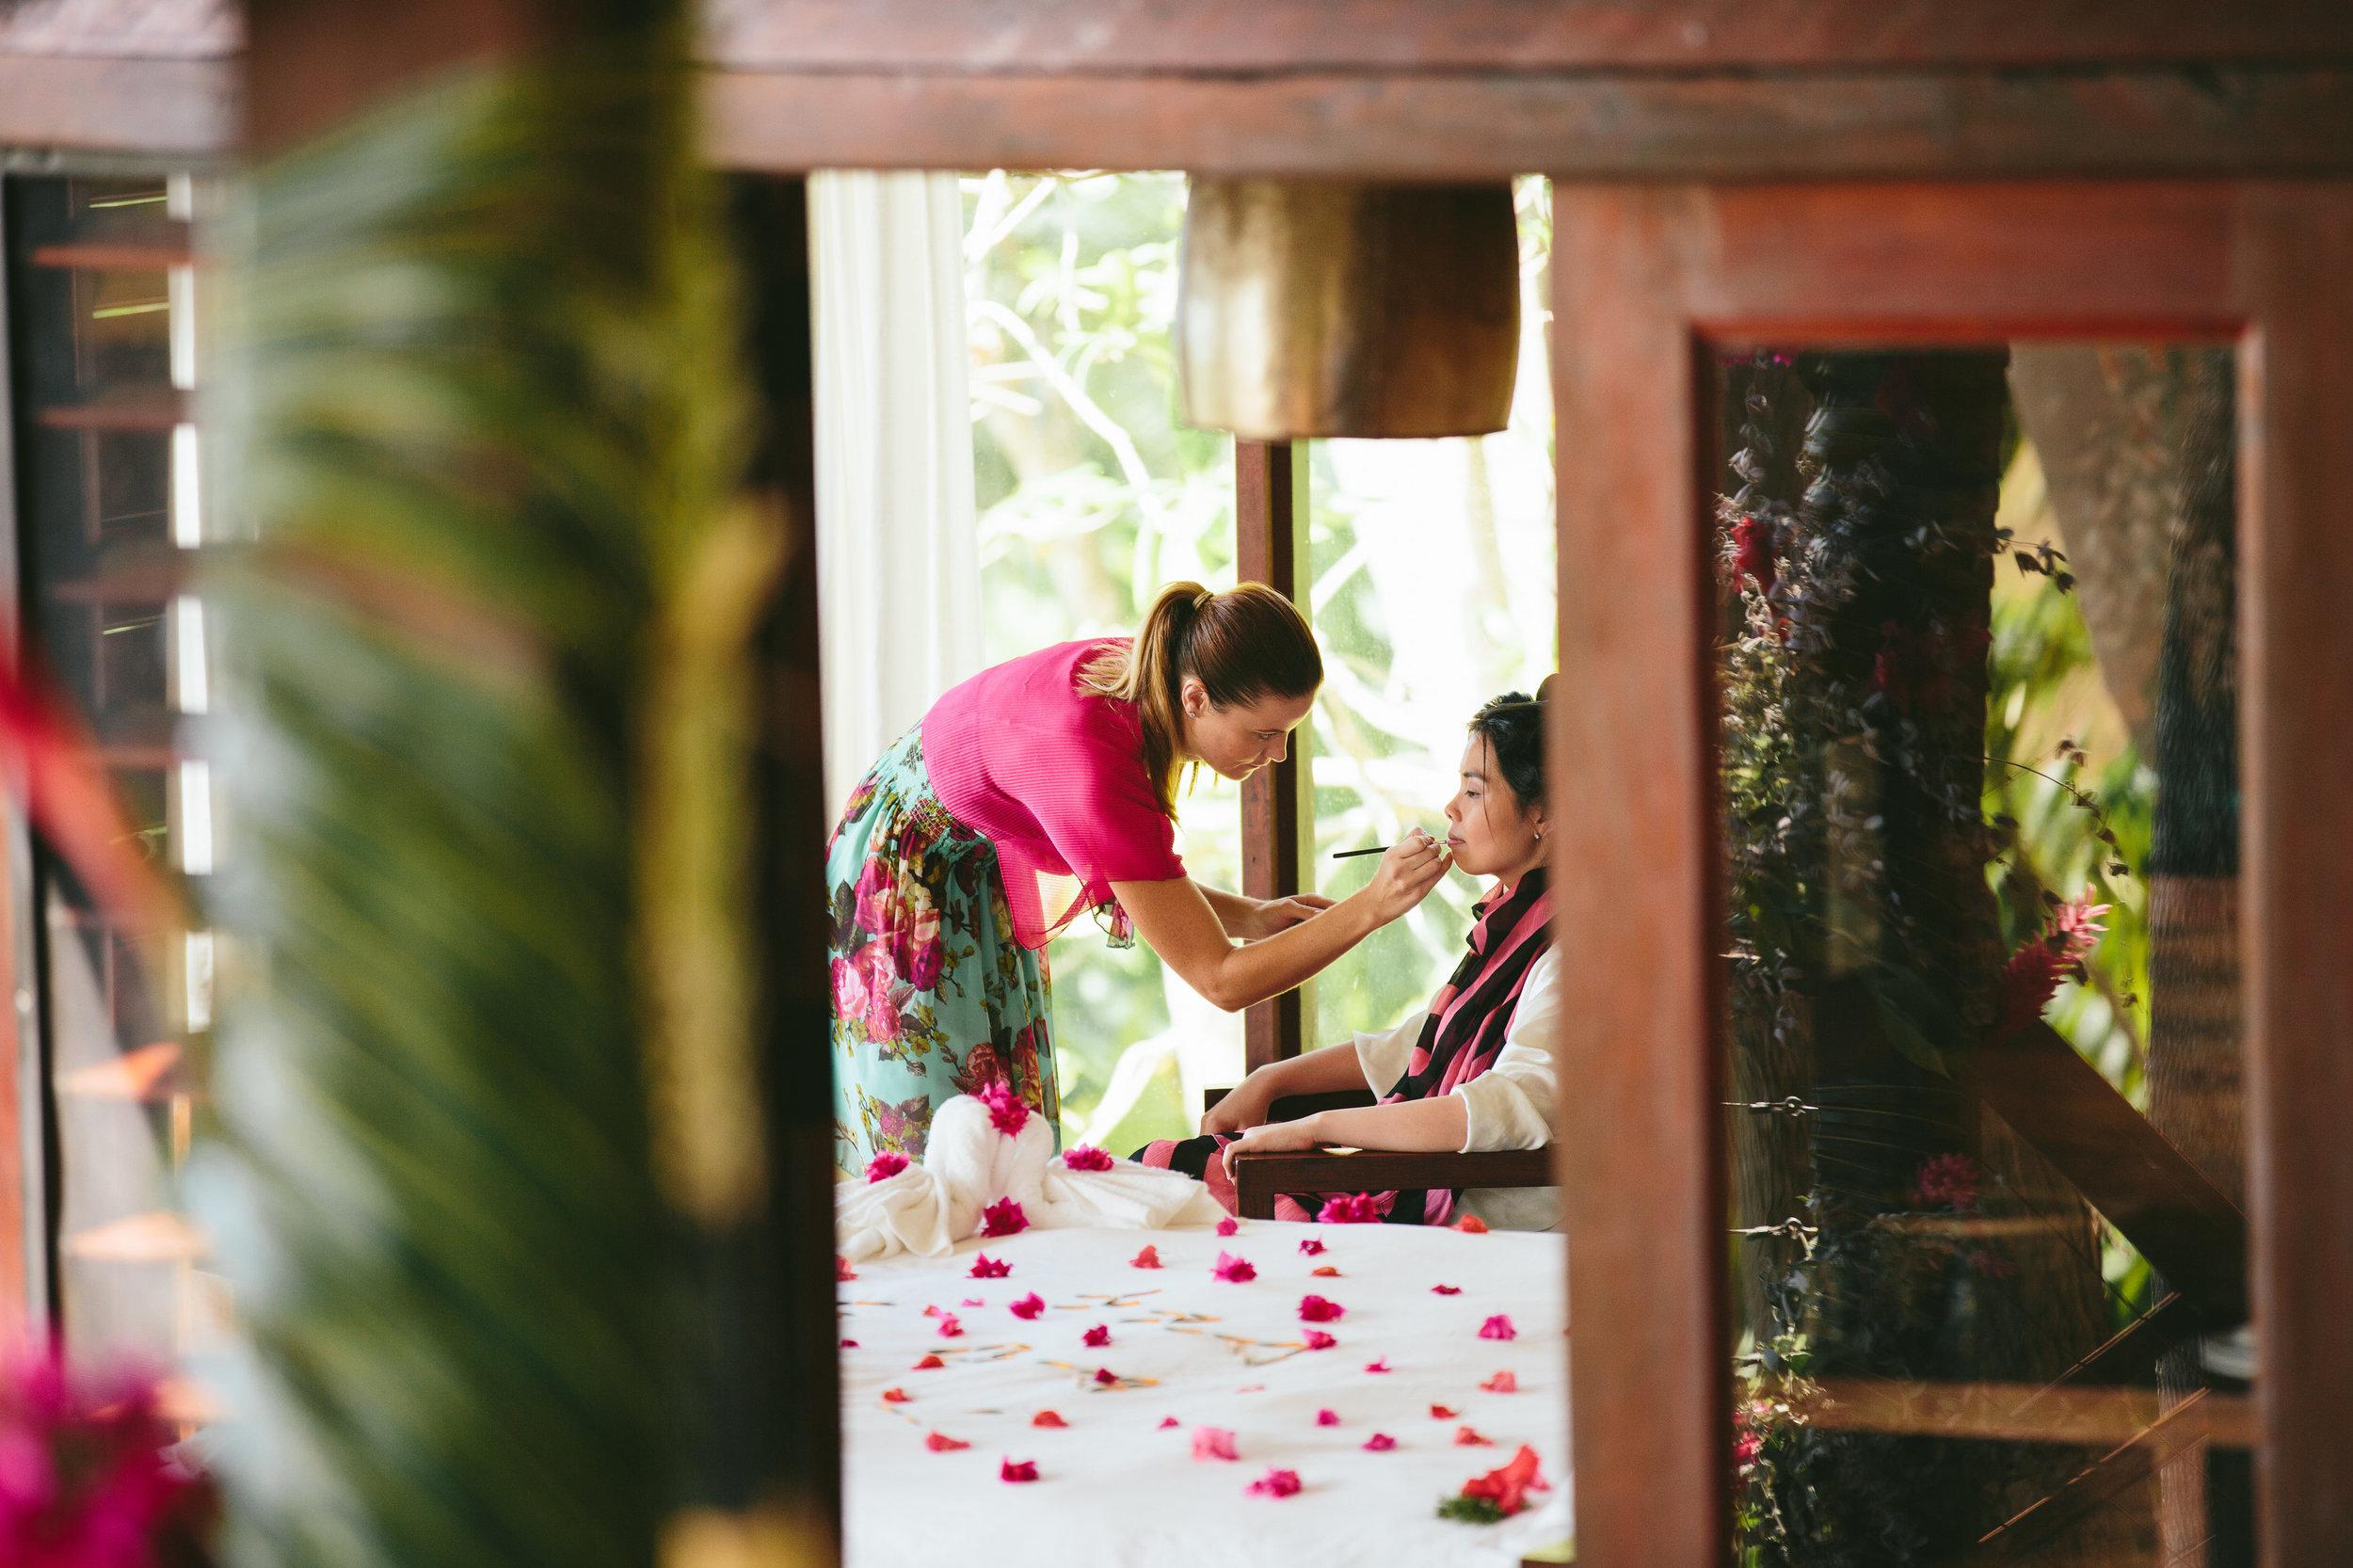 Fiji Wedding Hair and Makeup- Fiji Wedding Elopement - The Remote Resort Fiji Islands